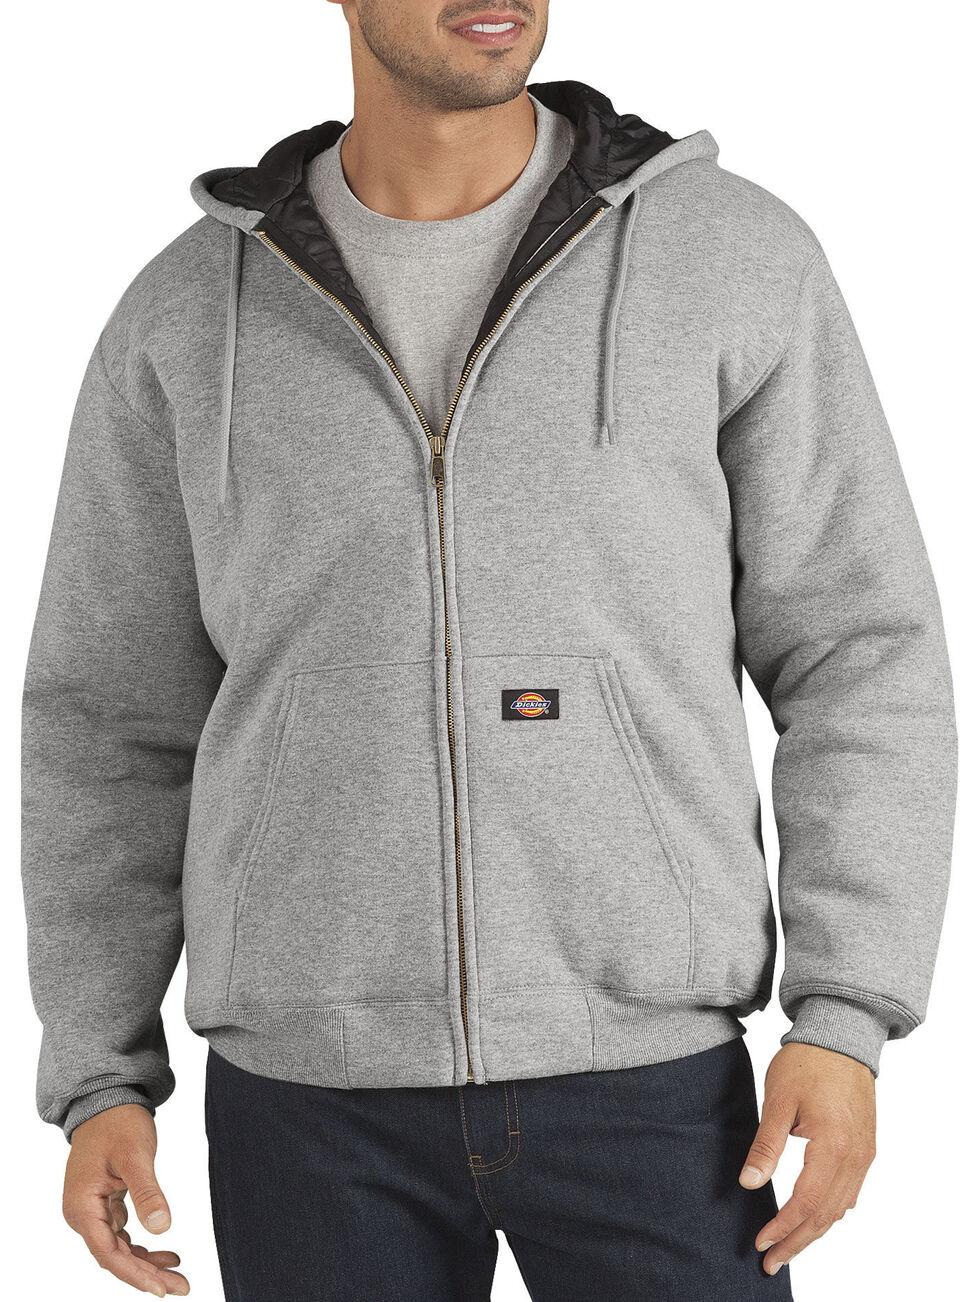 Dickies Heavyweight Quilted Fleece Zip-Up Hoodie - Big & Tall, Hthr Grey, hi-res